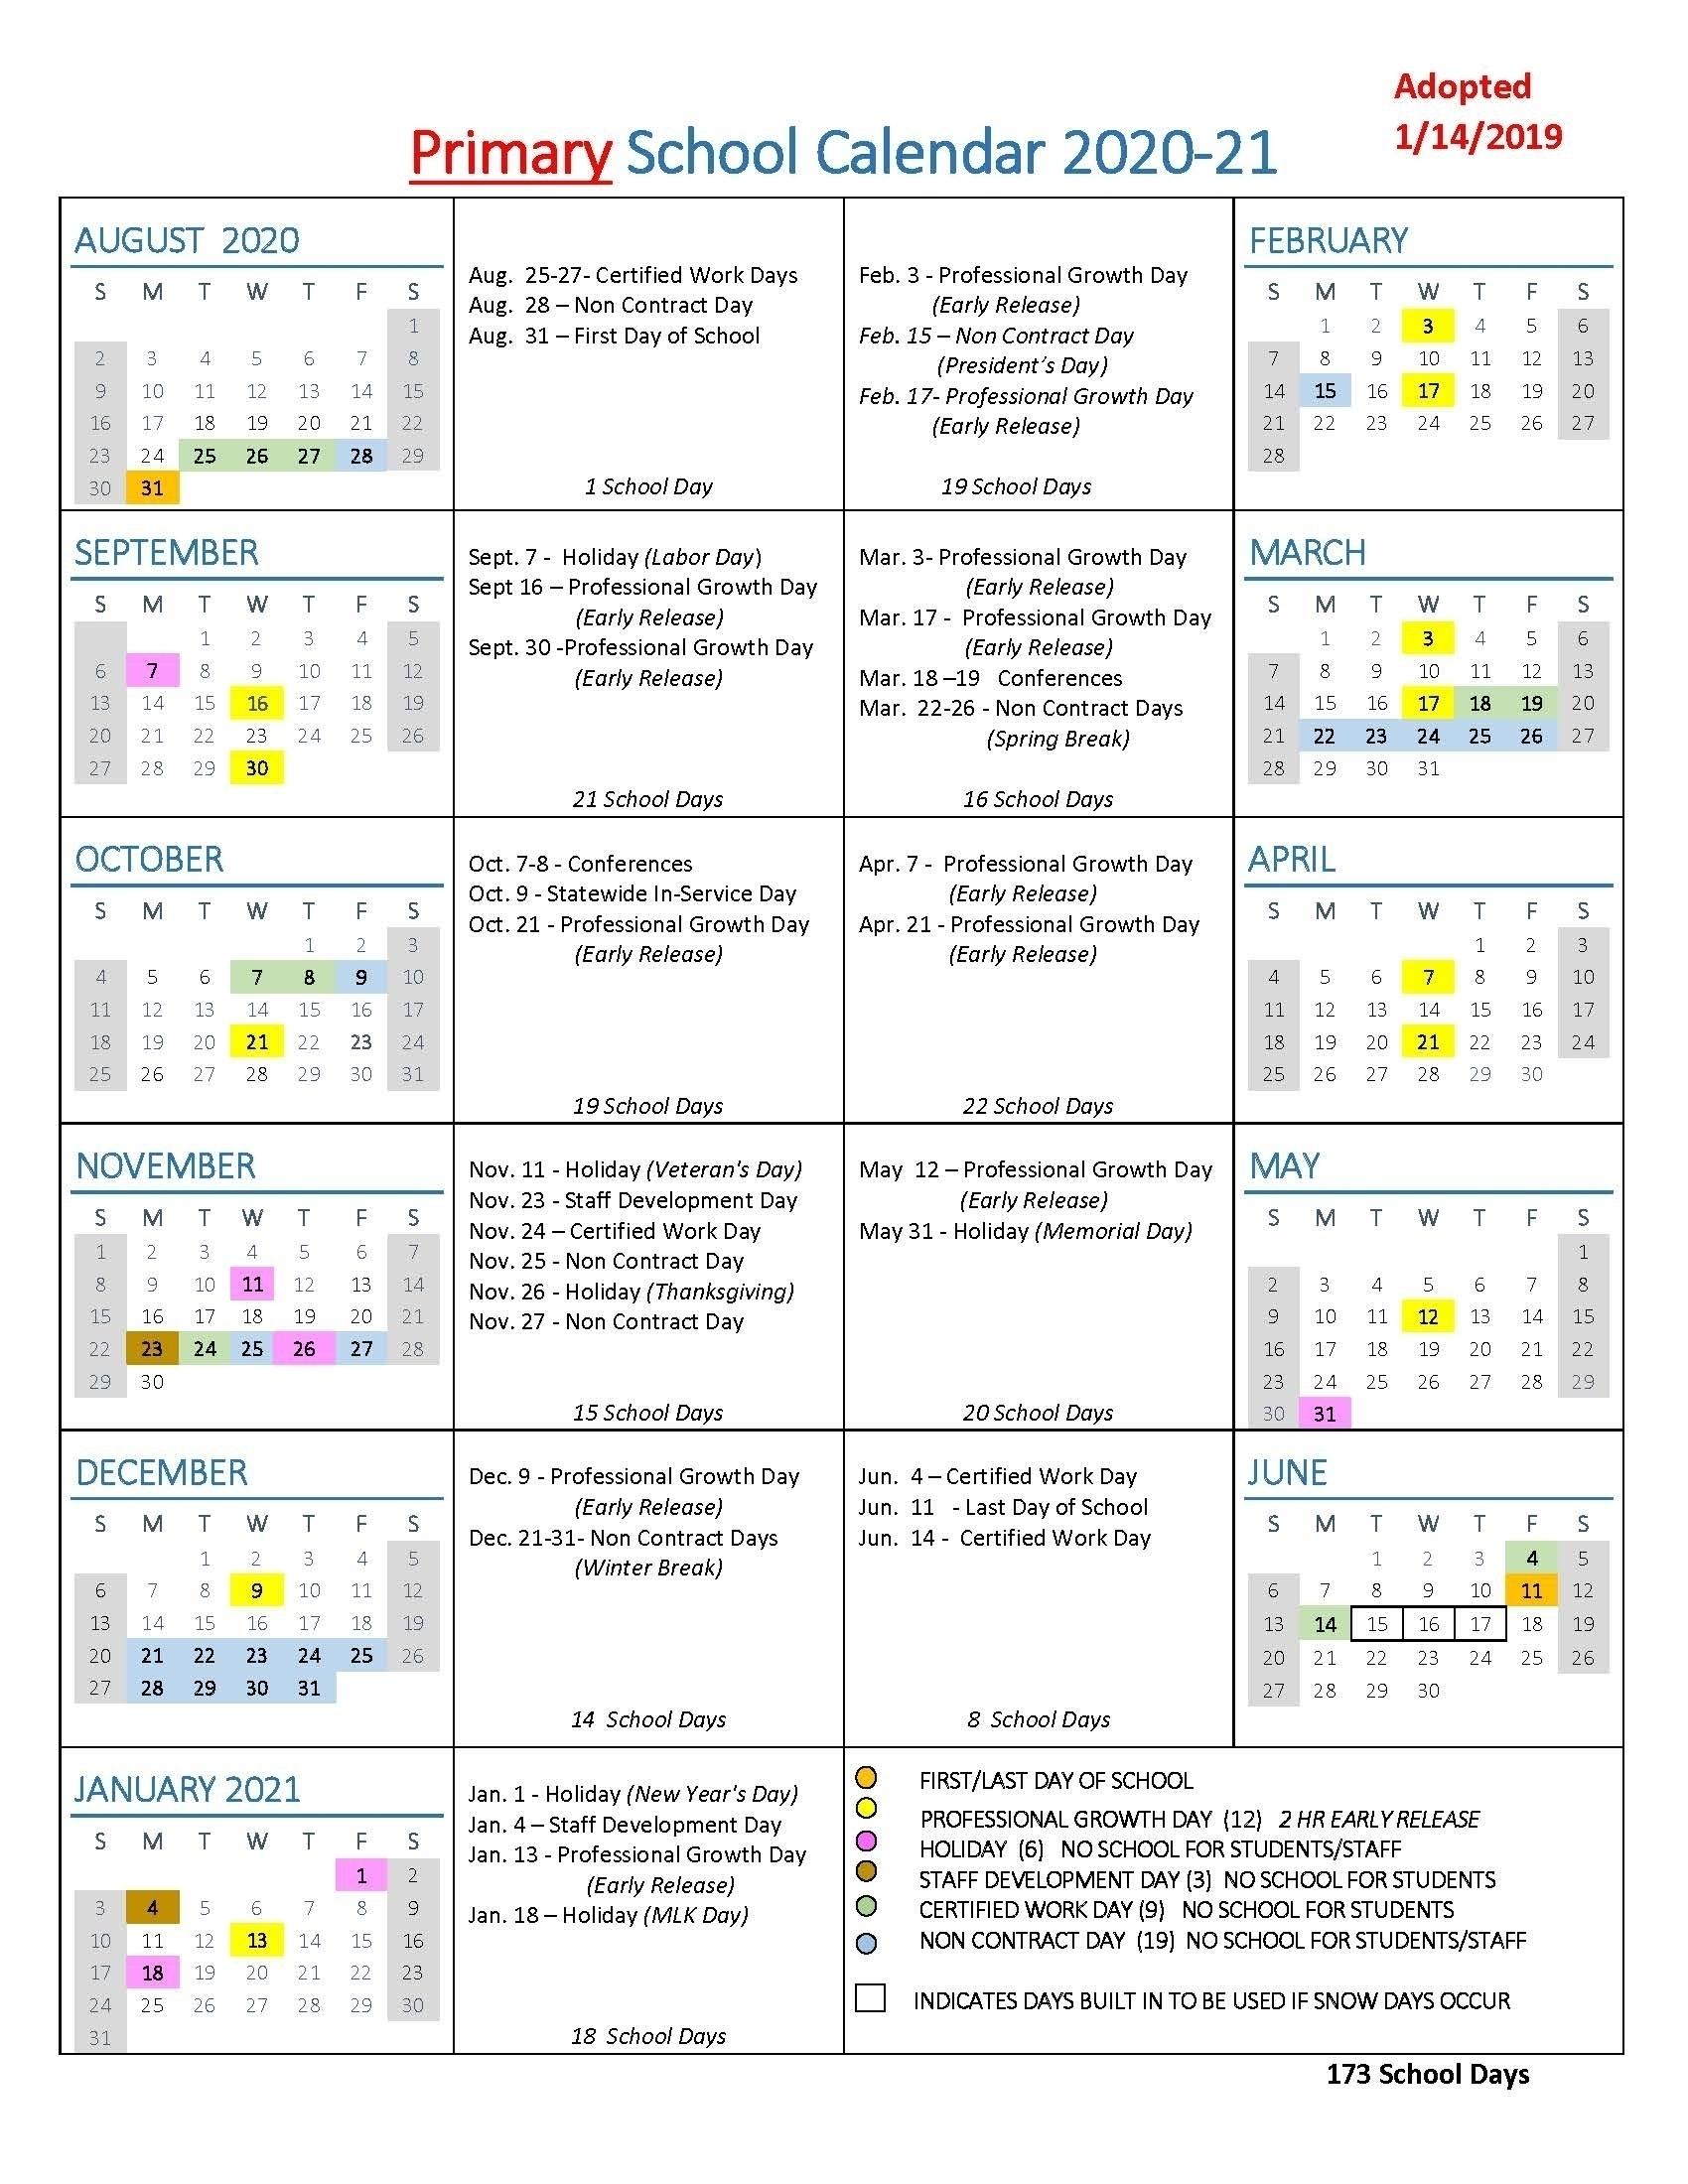 Year Of Special Days 2020 - Calendar Inspiration Design regarding Spec Ial Days In 2020